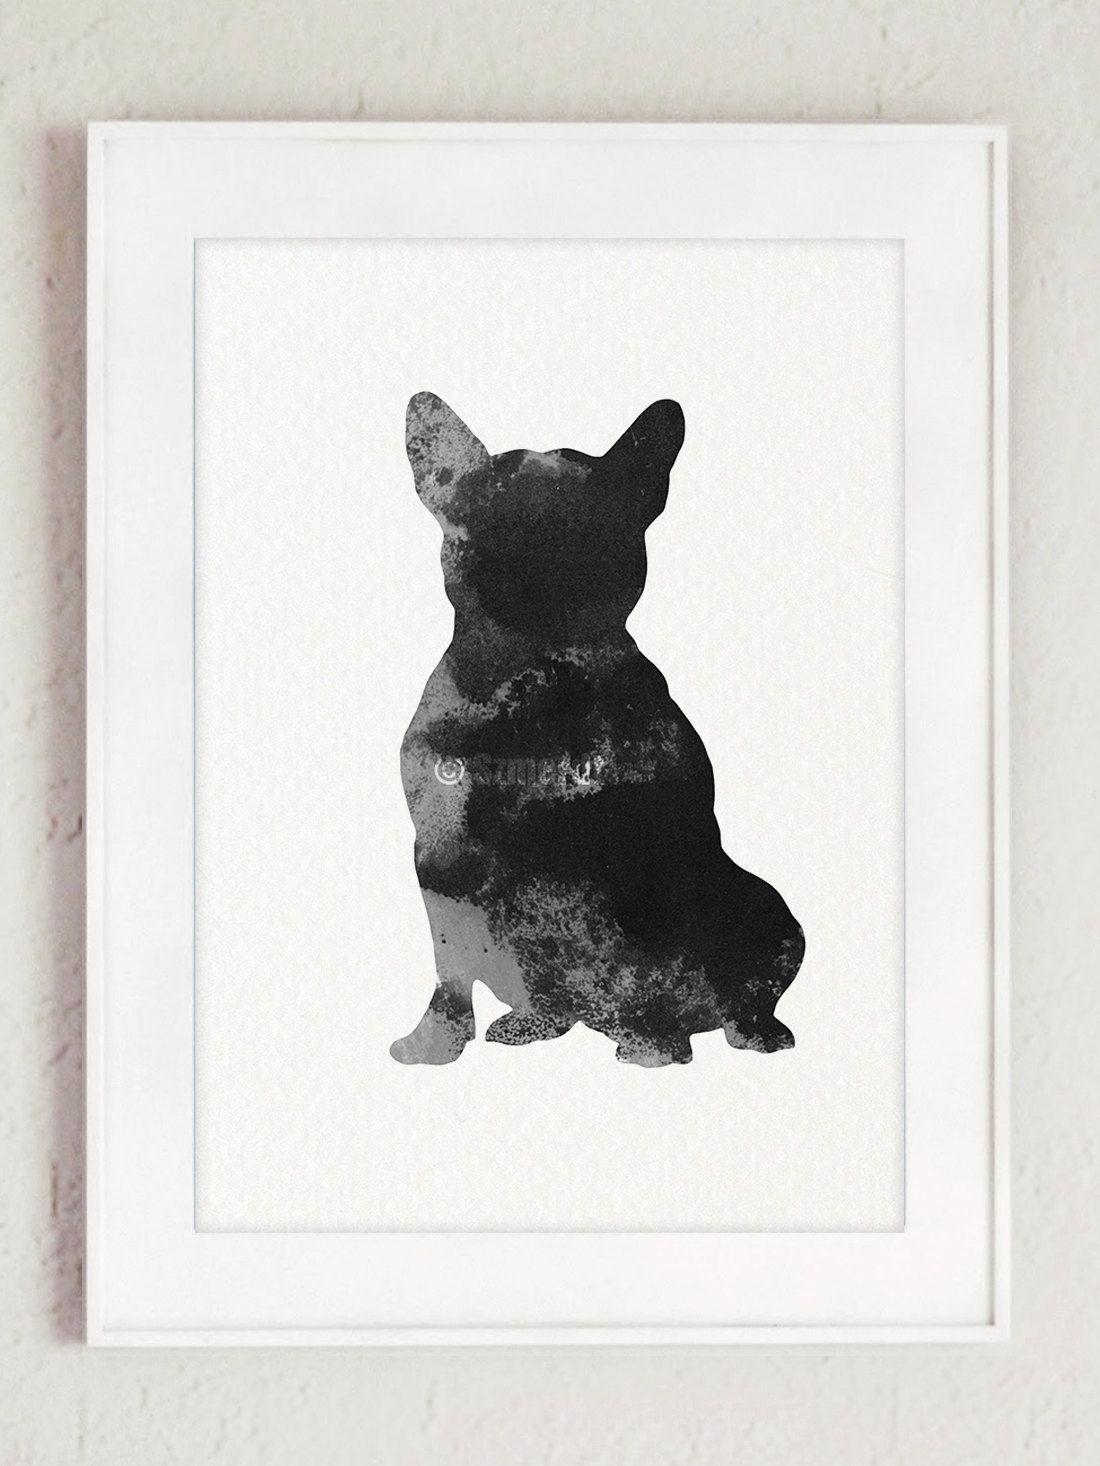 Frenchie Giclee Print, Dog Poster, French Bulldog